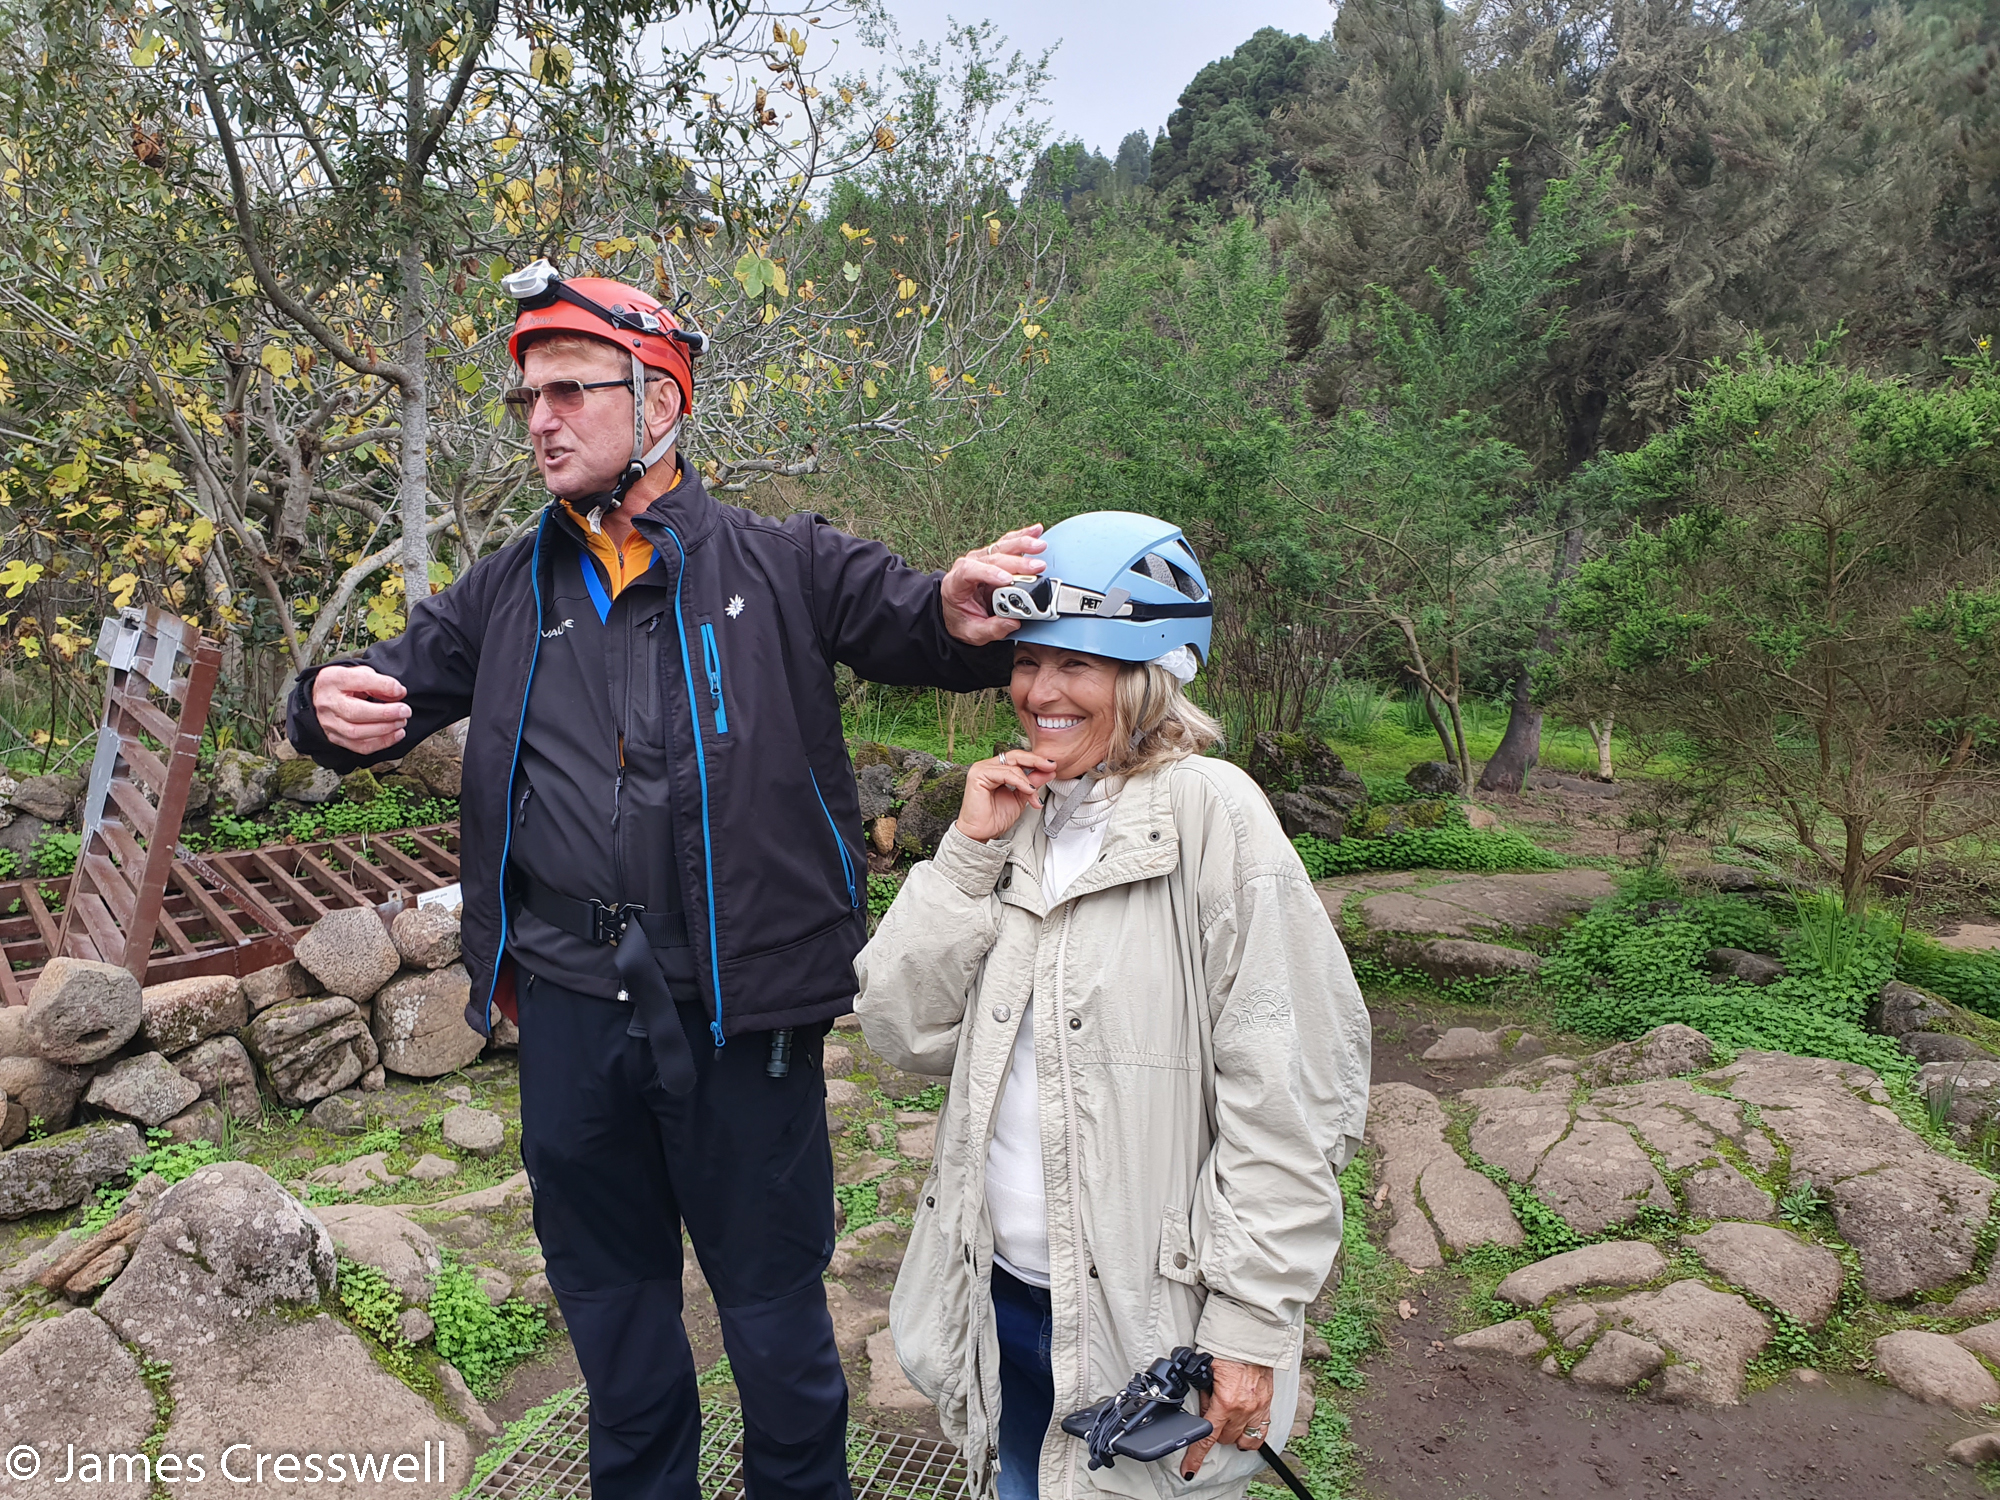 Man helping lady adjust her helmet light